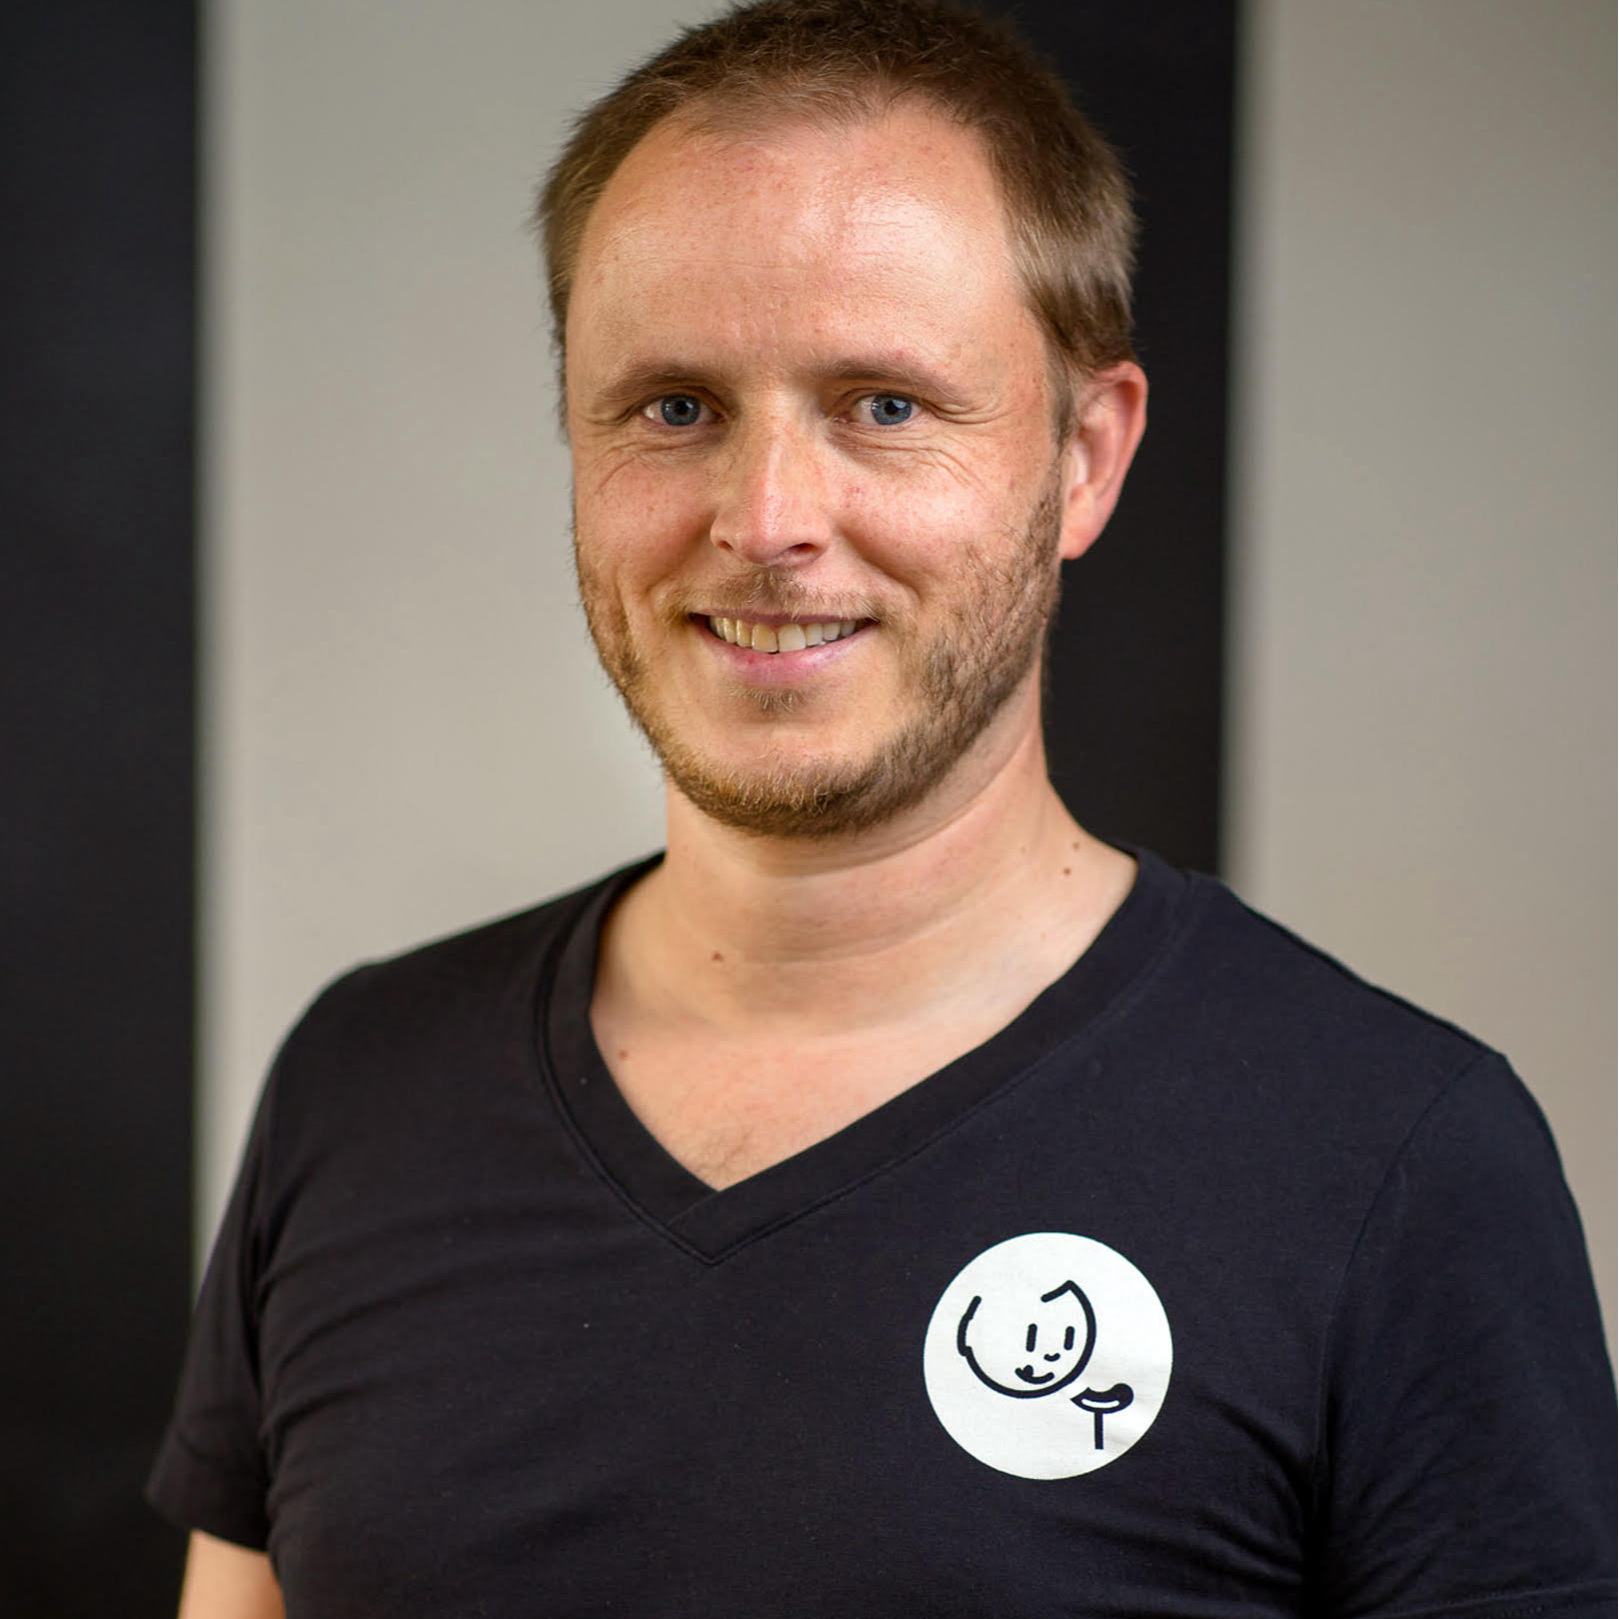 Andreas Längricht